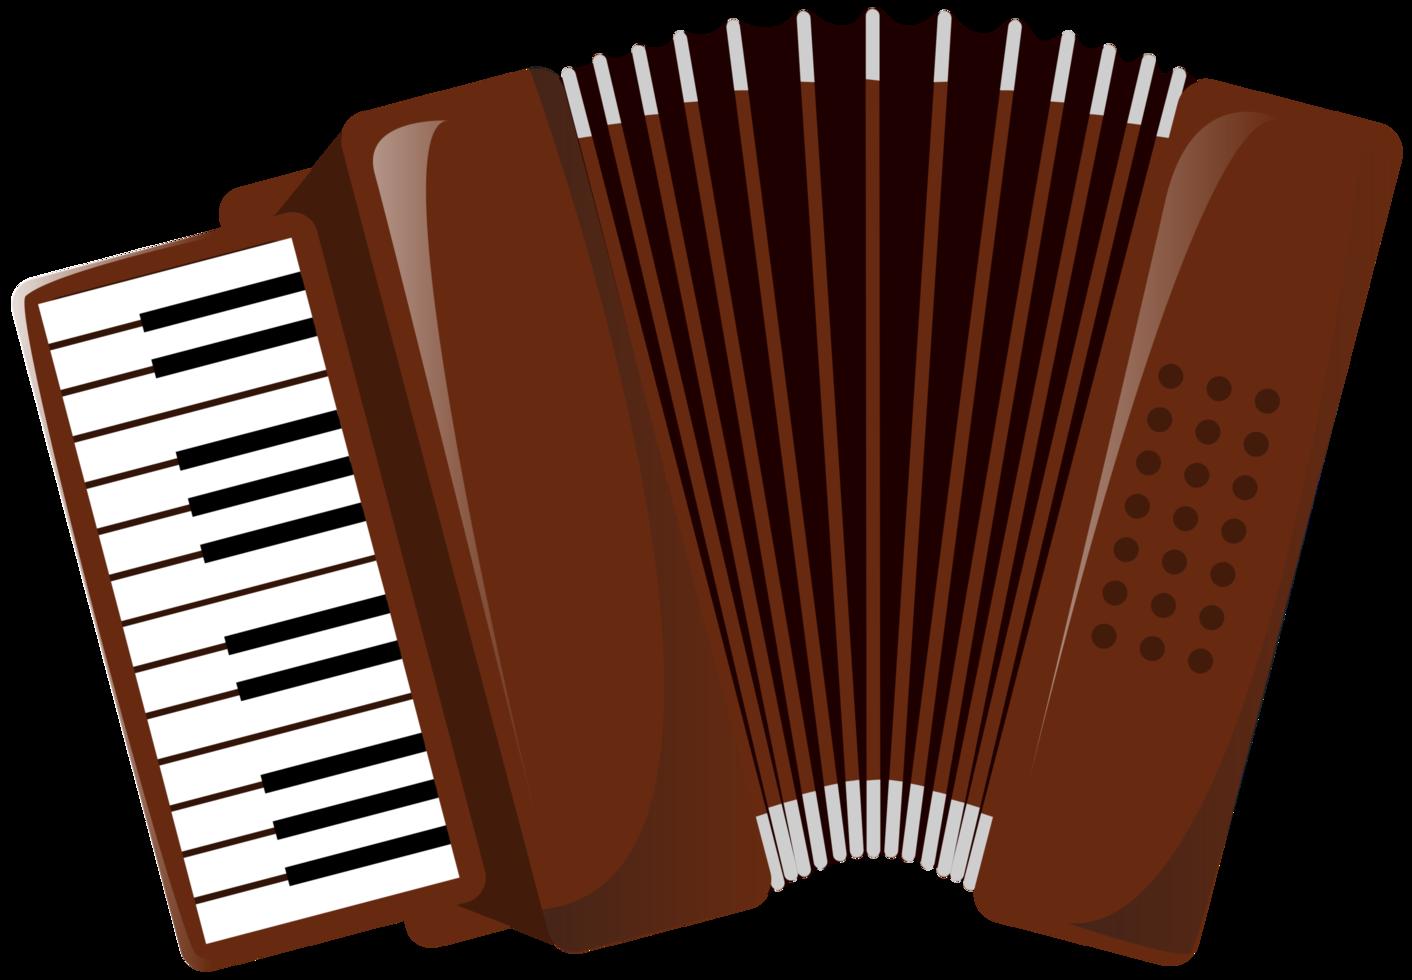 mariachi muziekinstrument arcodion png